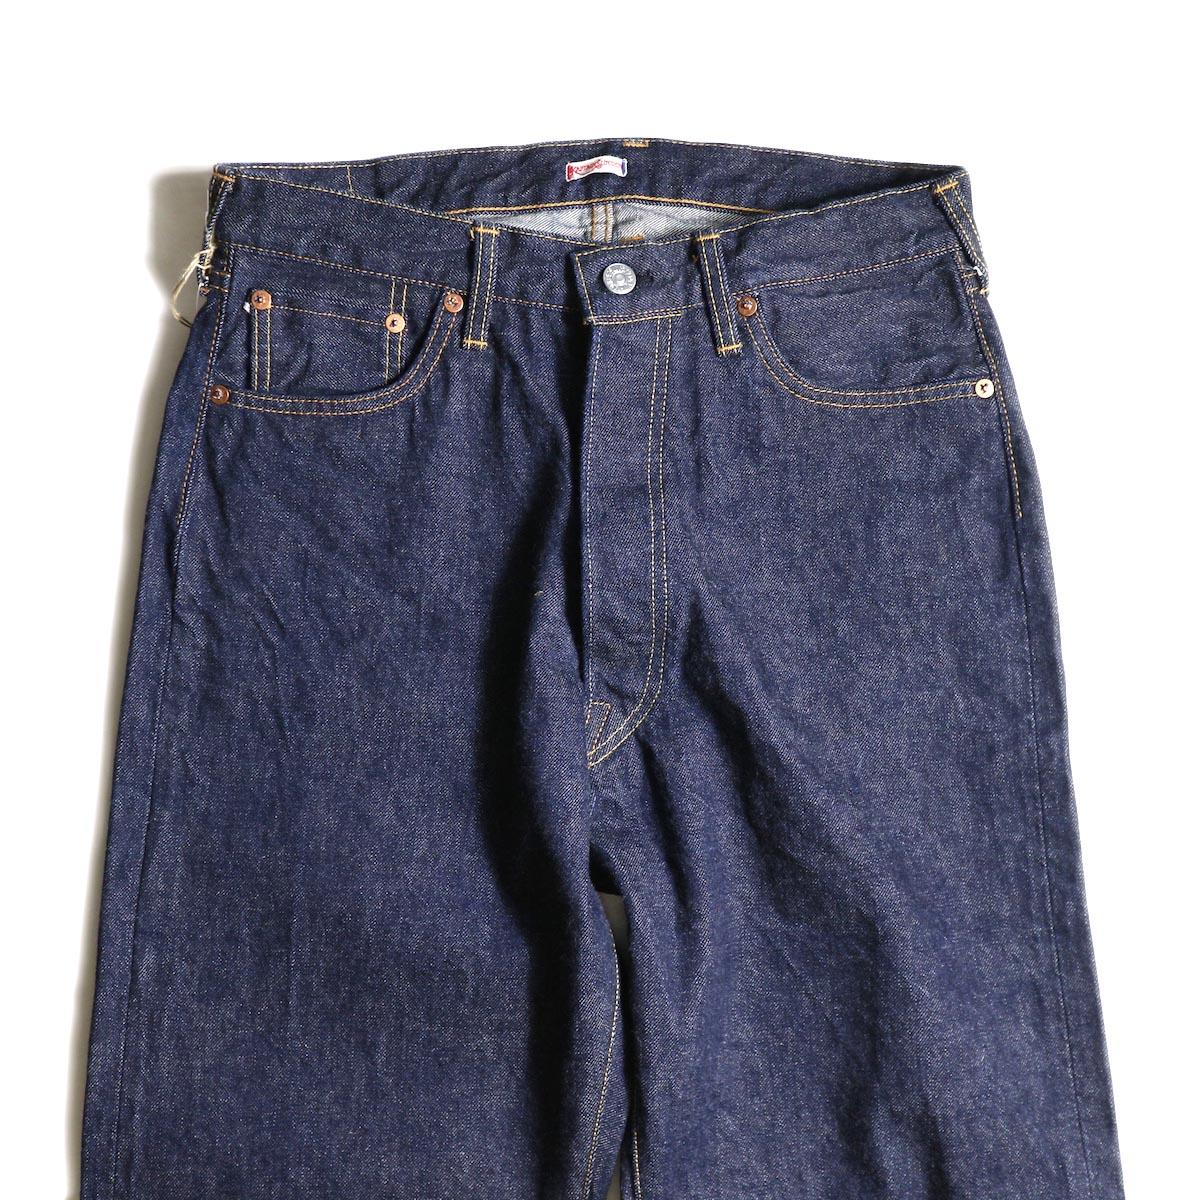 Kaptain Sunshine / Baggy Cut Straight Denim Pants -One Wash ウエスト